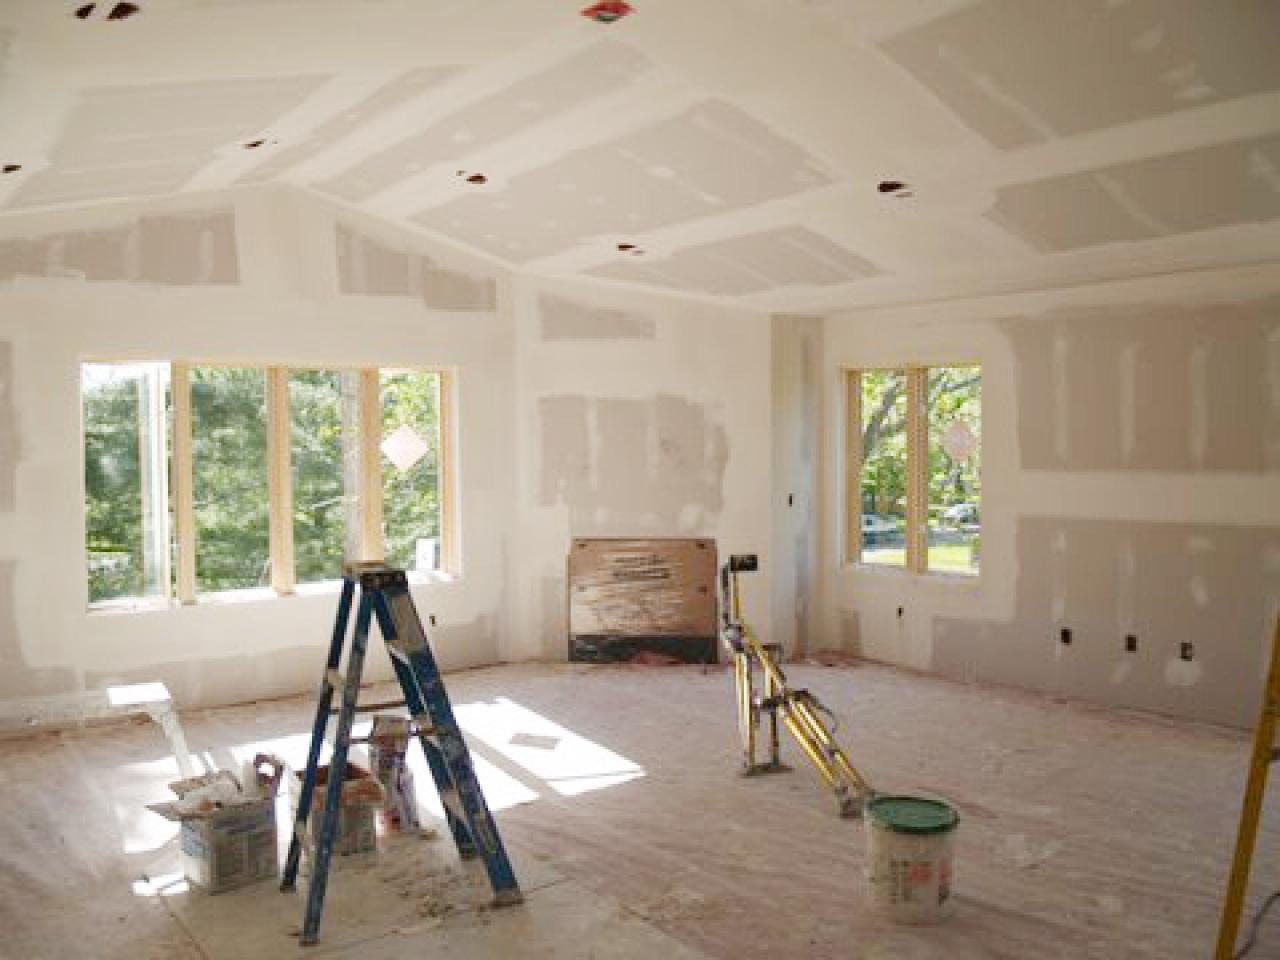 Kitchen Remodel - Wood or Ceramic Floors